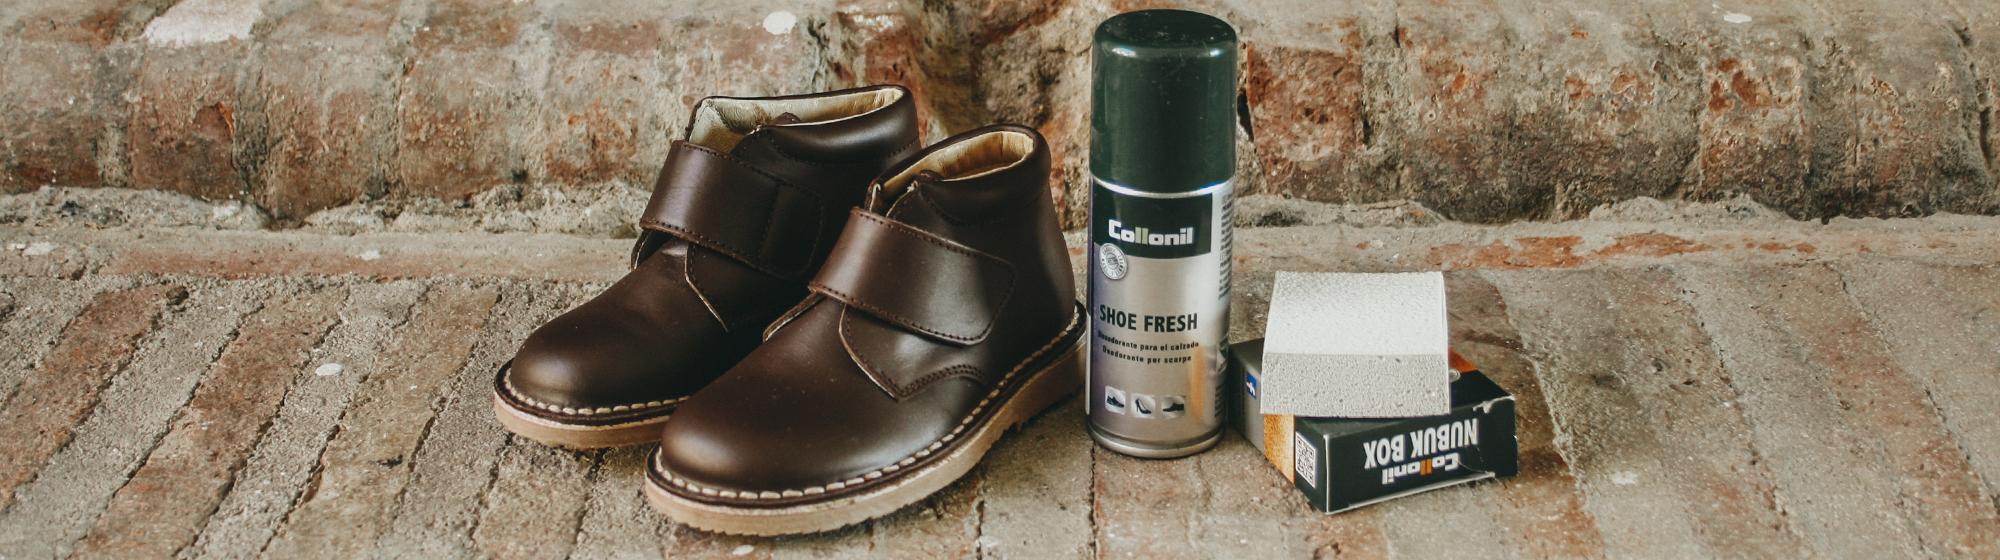 Pour nettoyer les chaussures